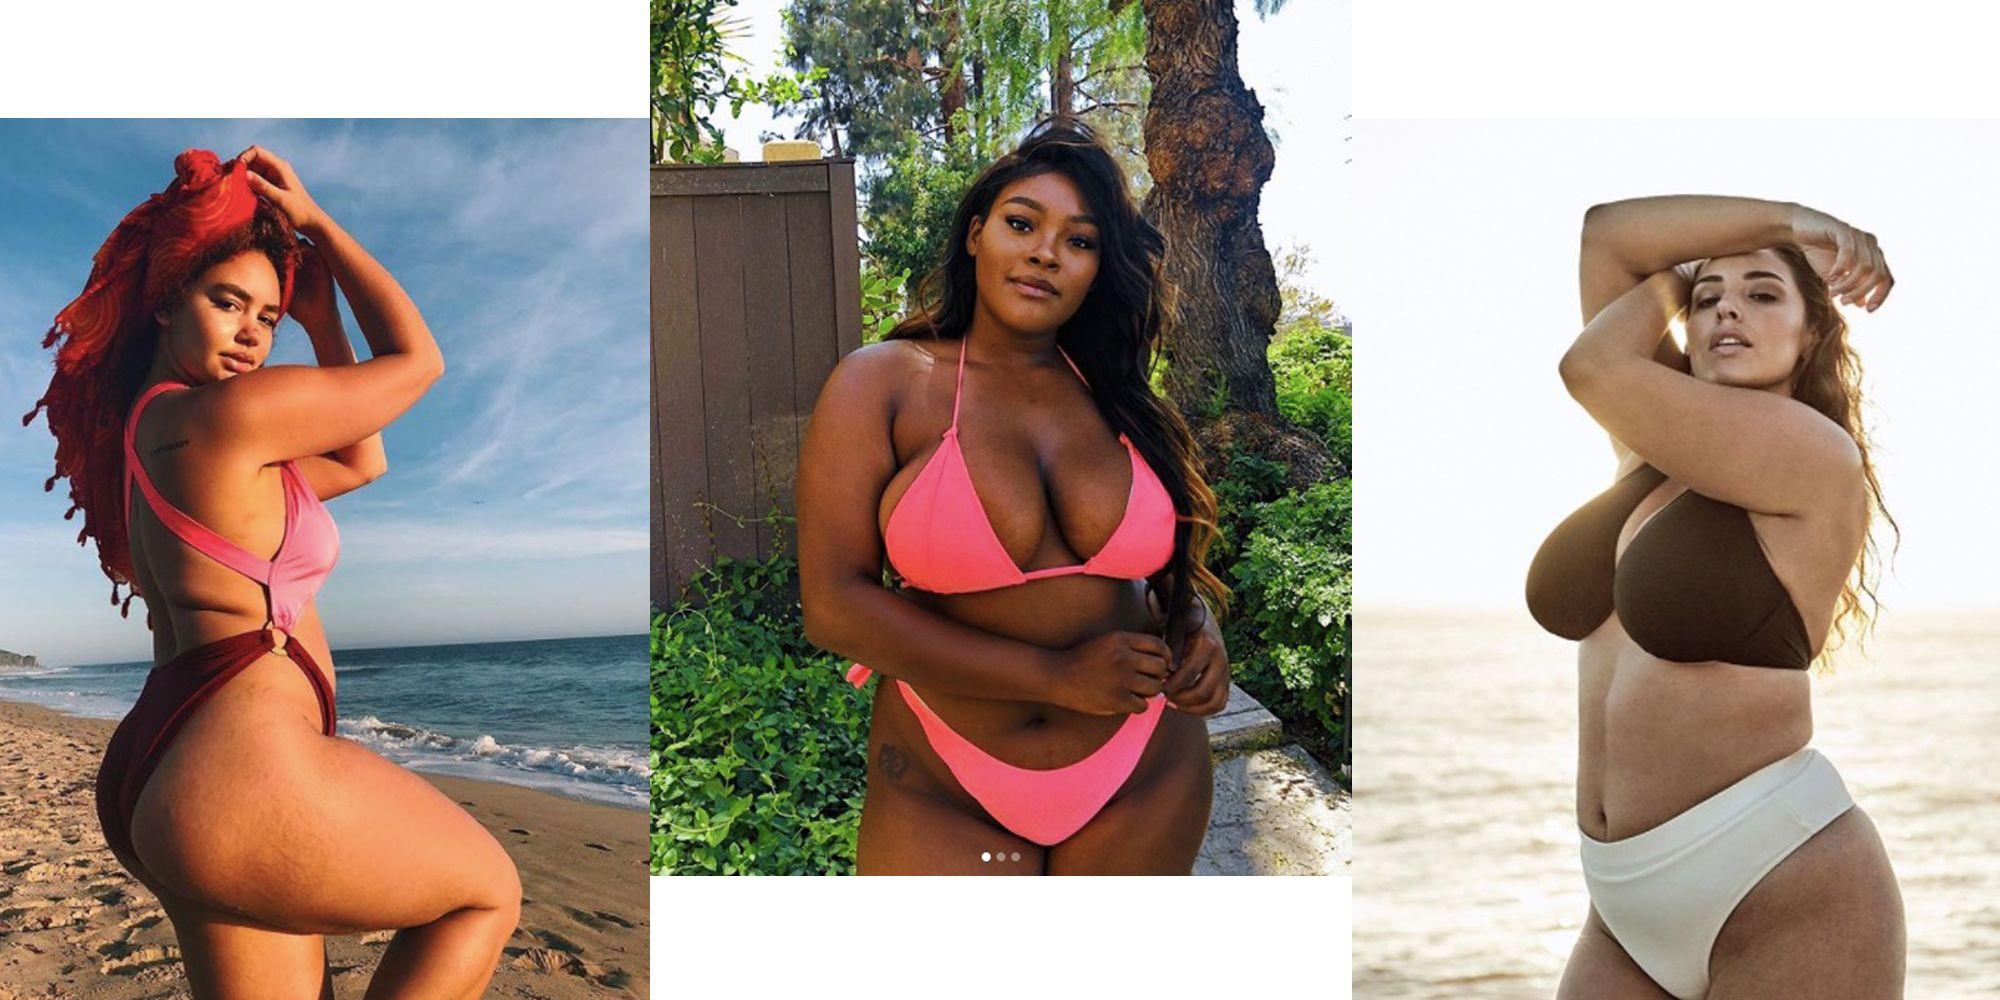 Curvy Plus Size Model Instagram